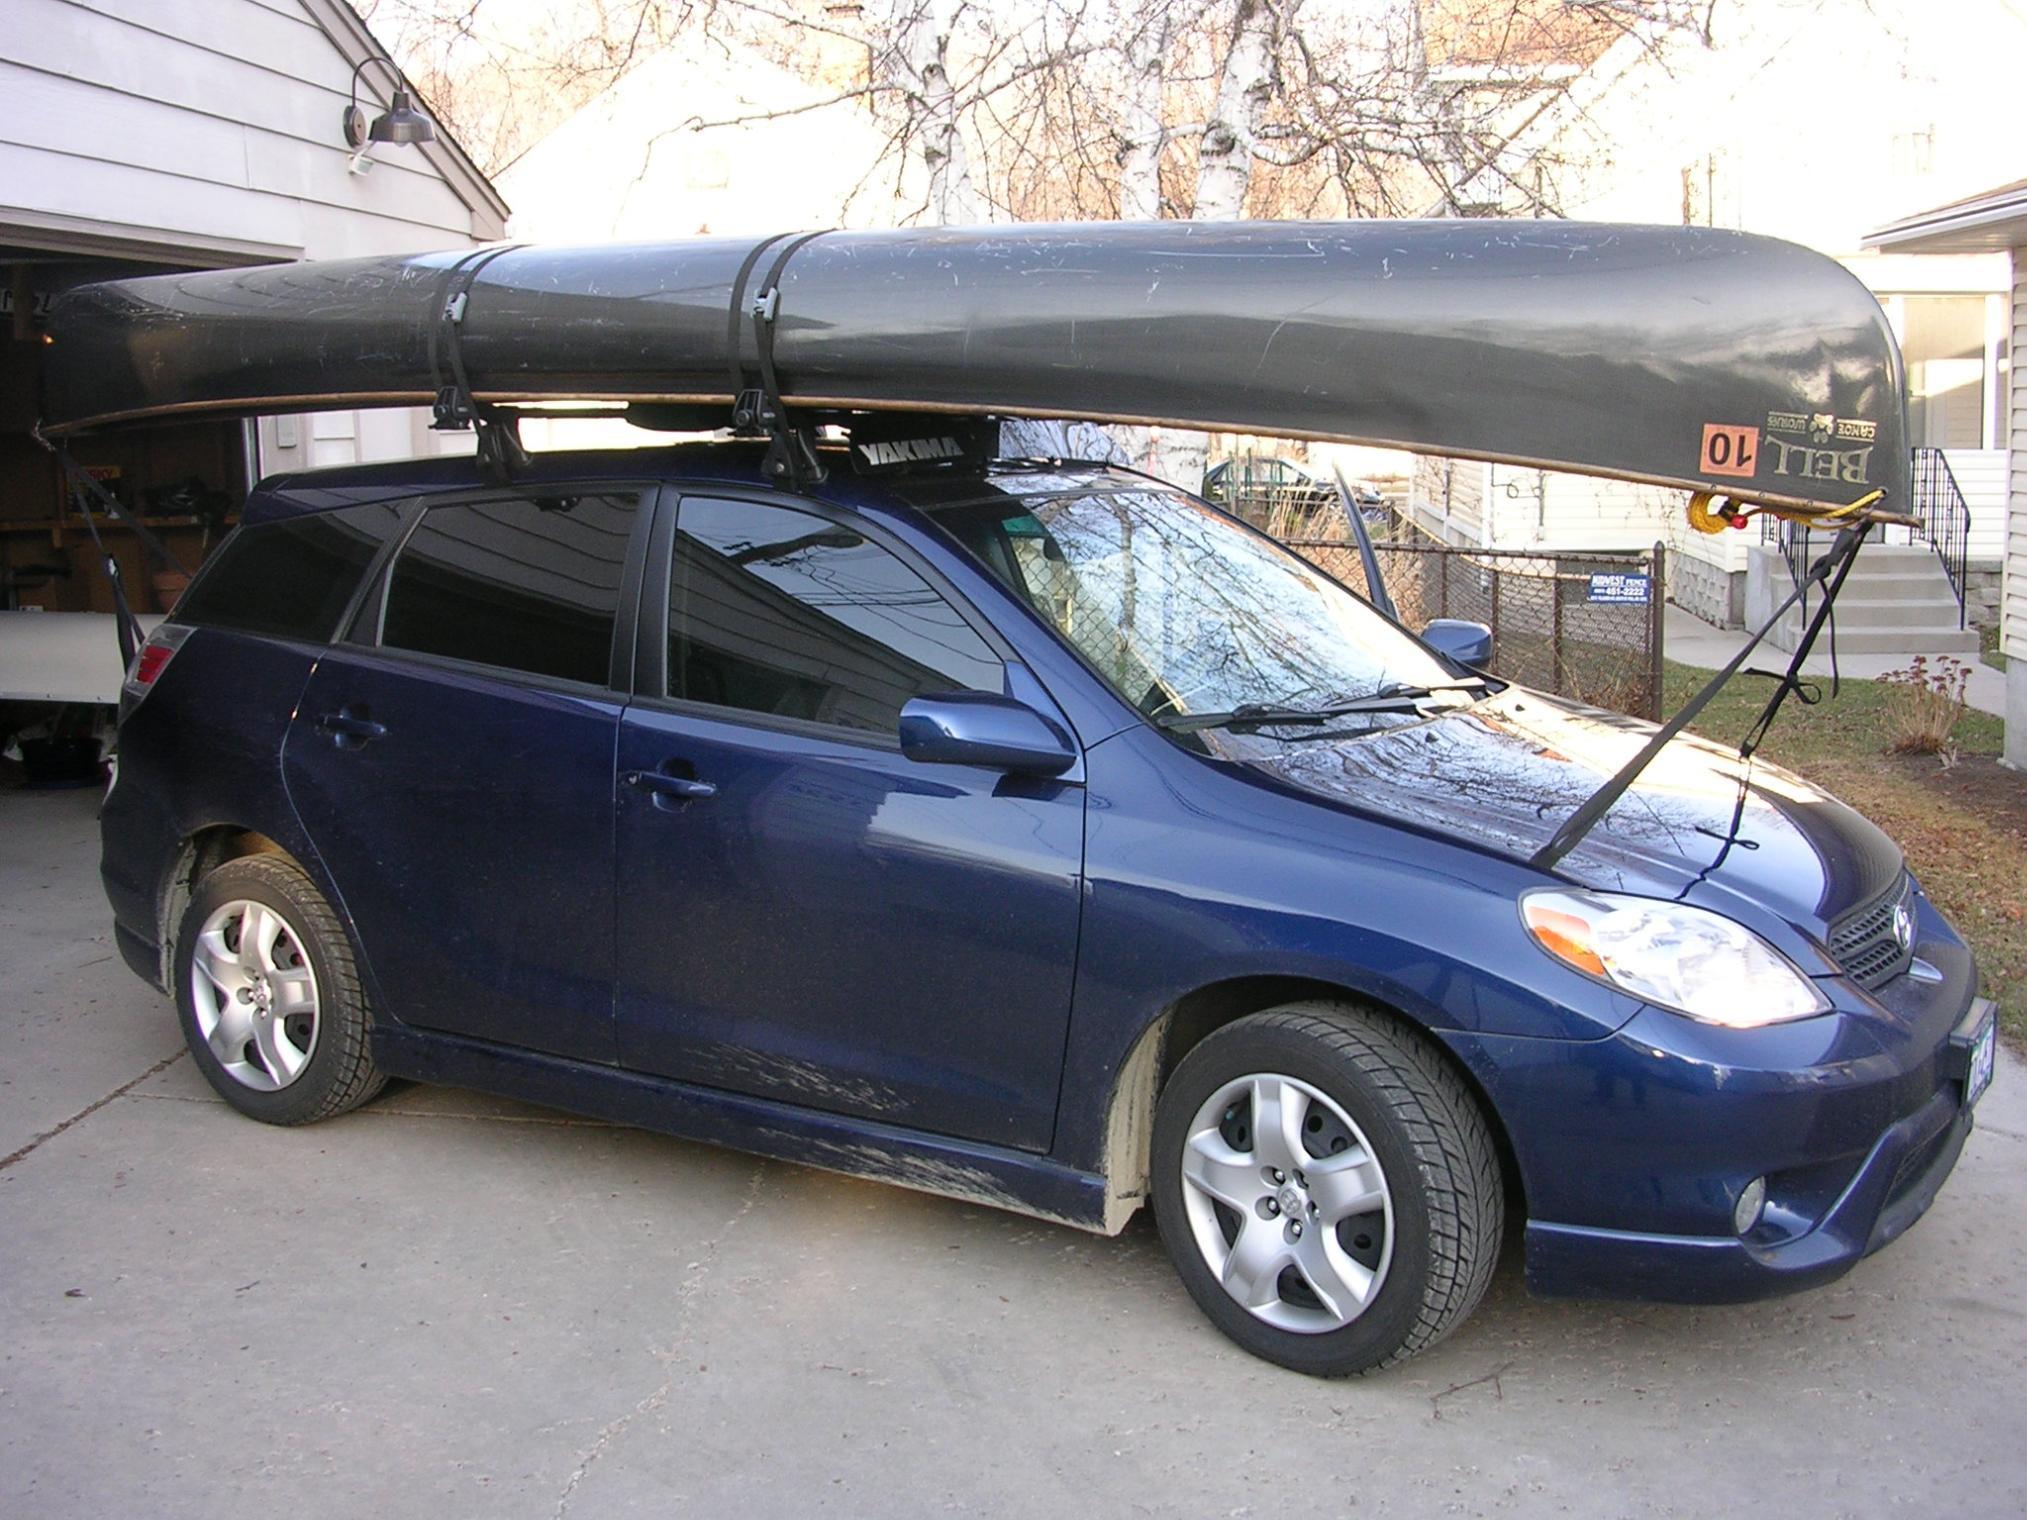 Bwca Hauling Canoe Toyoto Corrolla Boundary Waters Gear